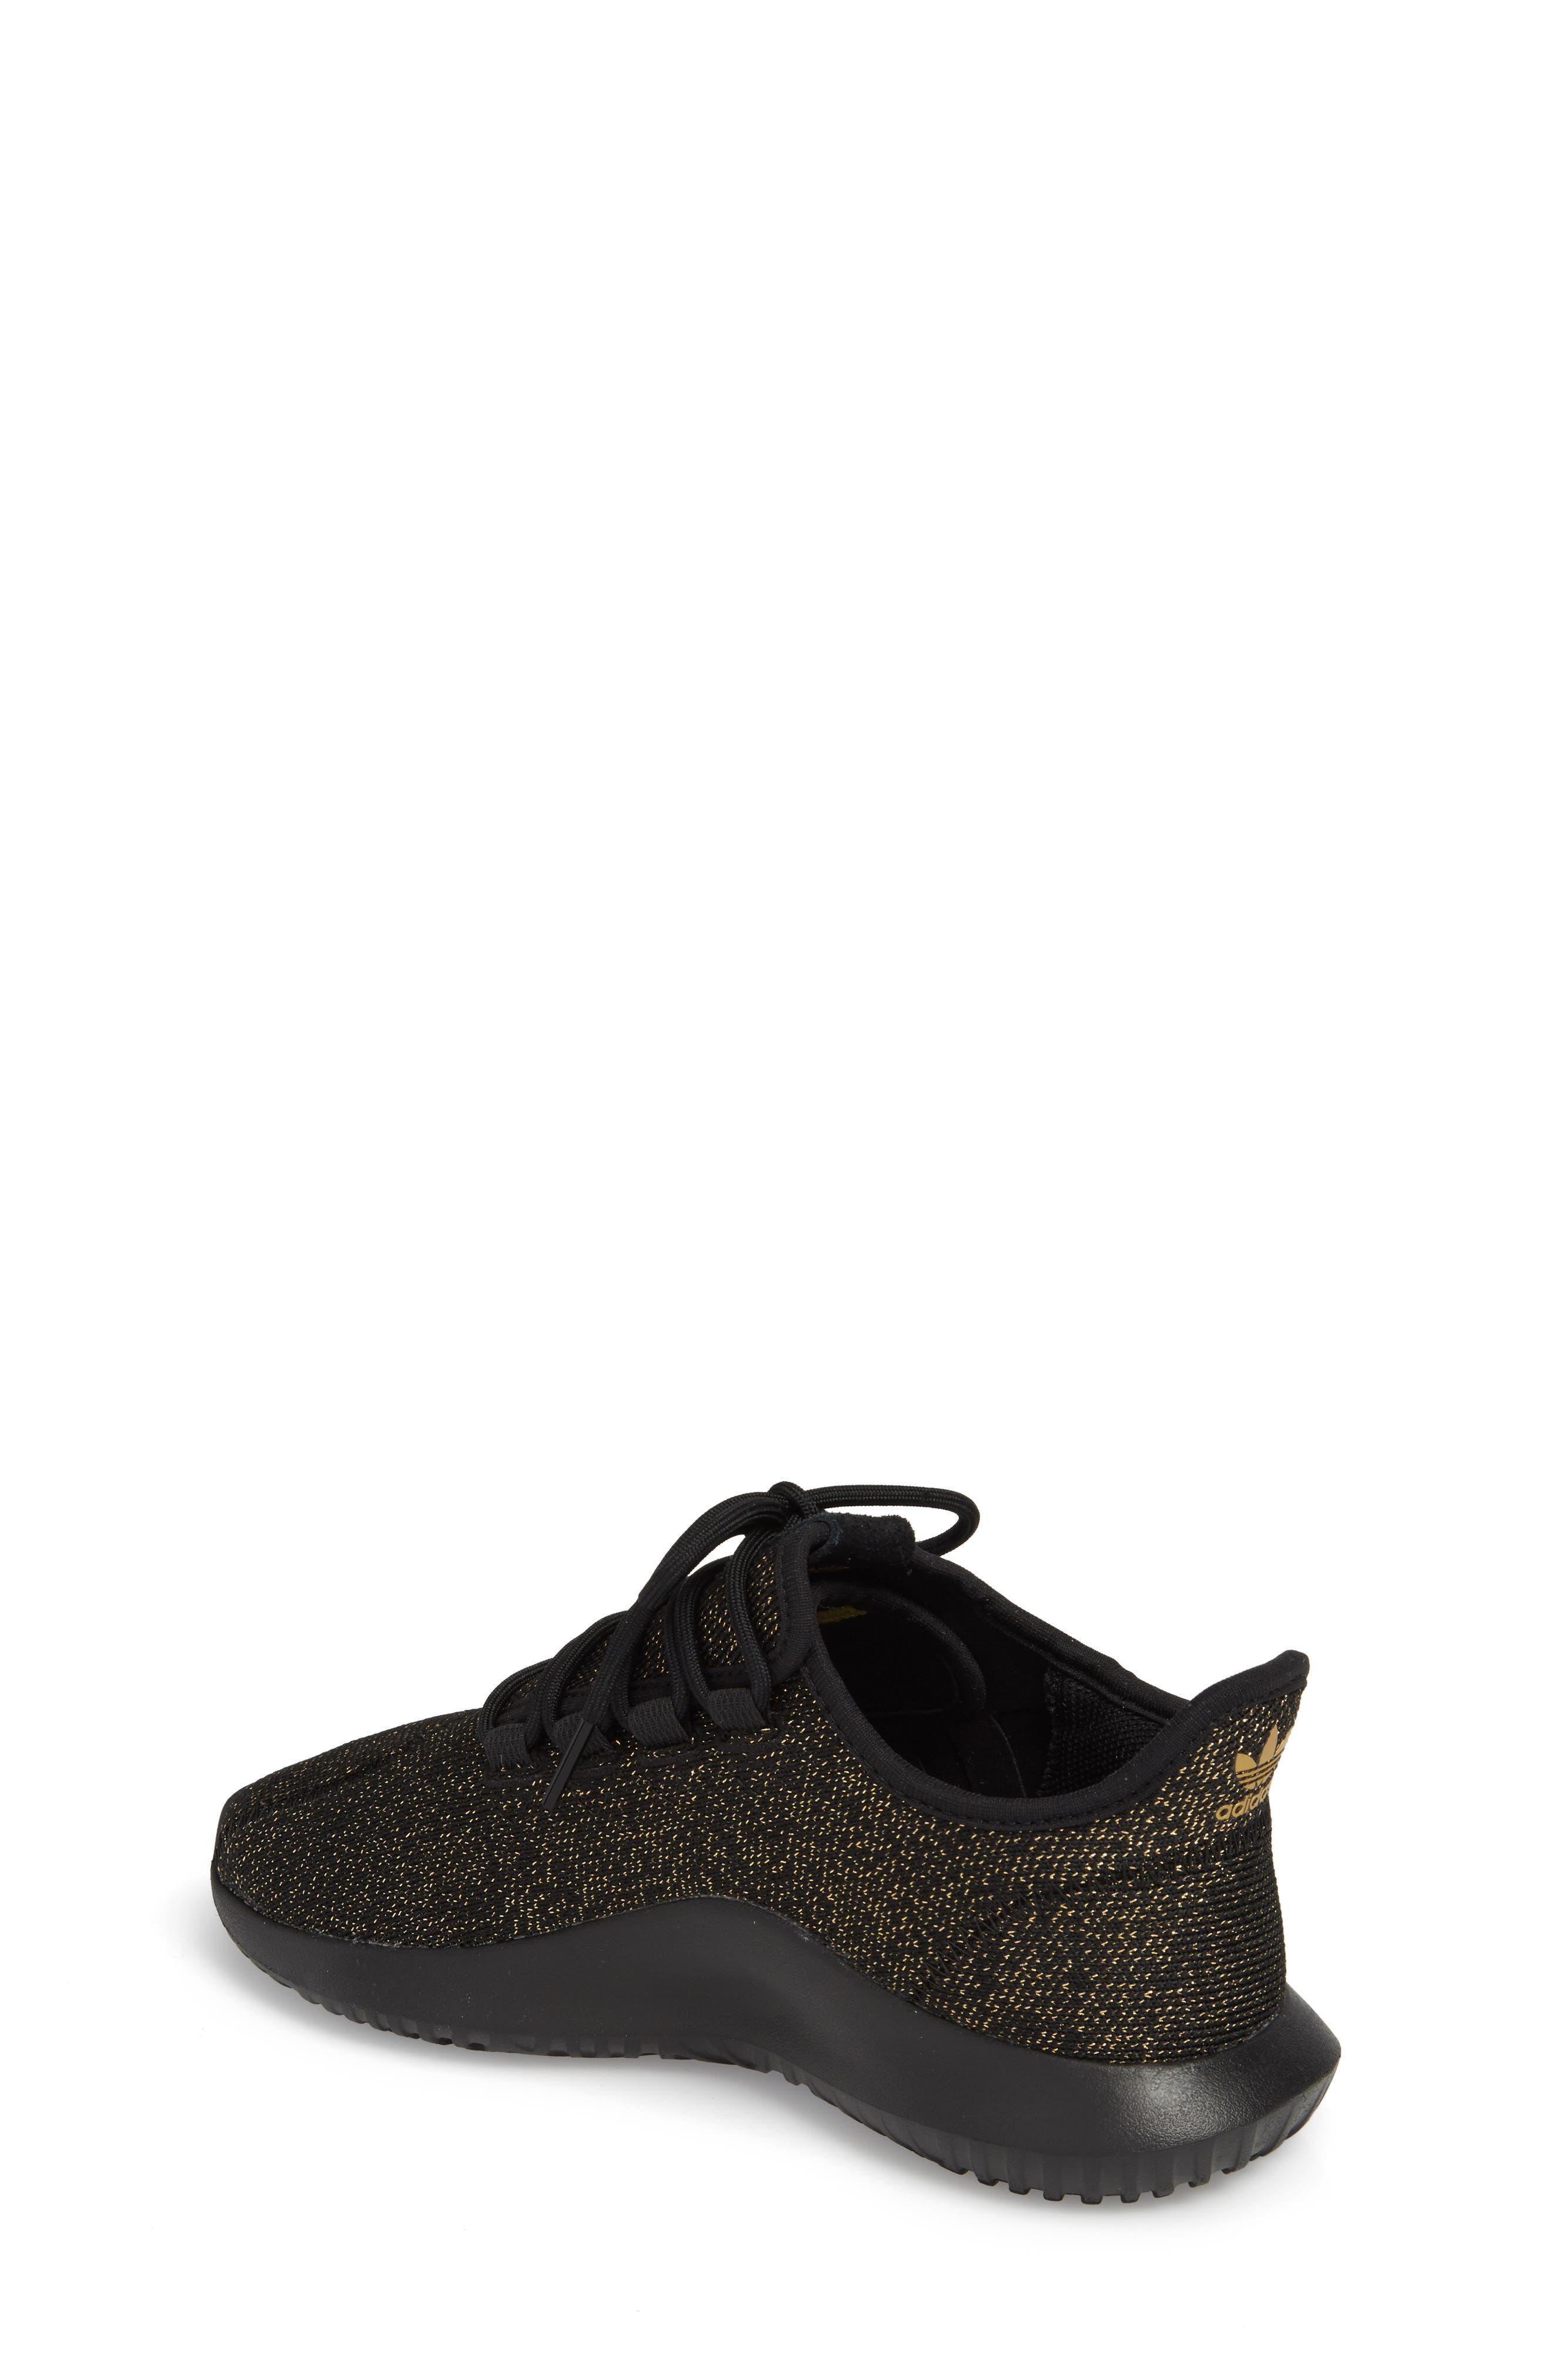 Tubular Shadow Sneaker,                             Alternate thumbnail 2, color,                             Core Black